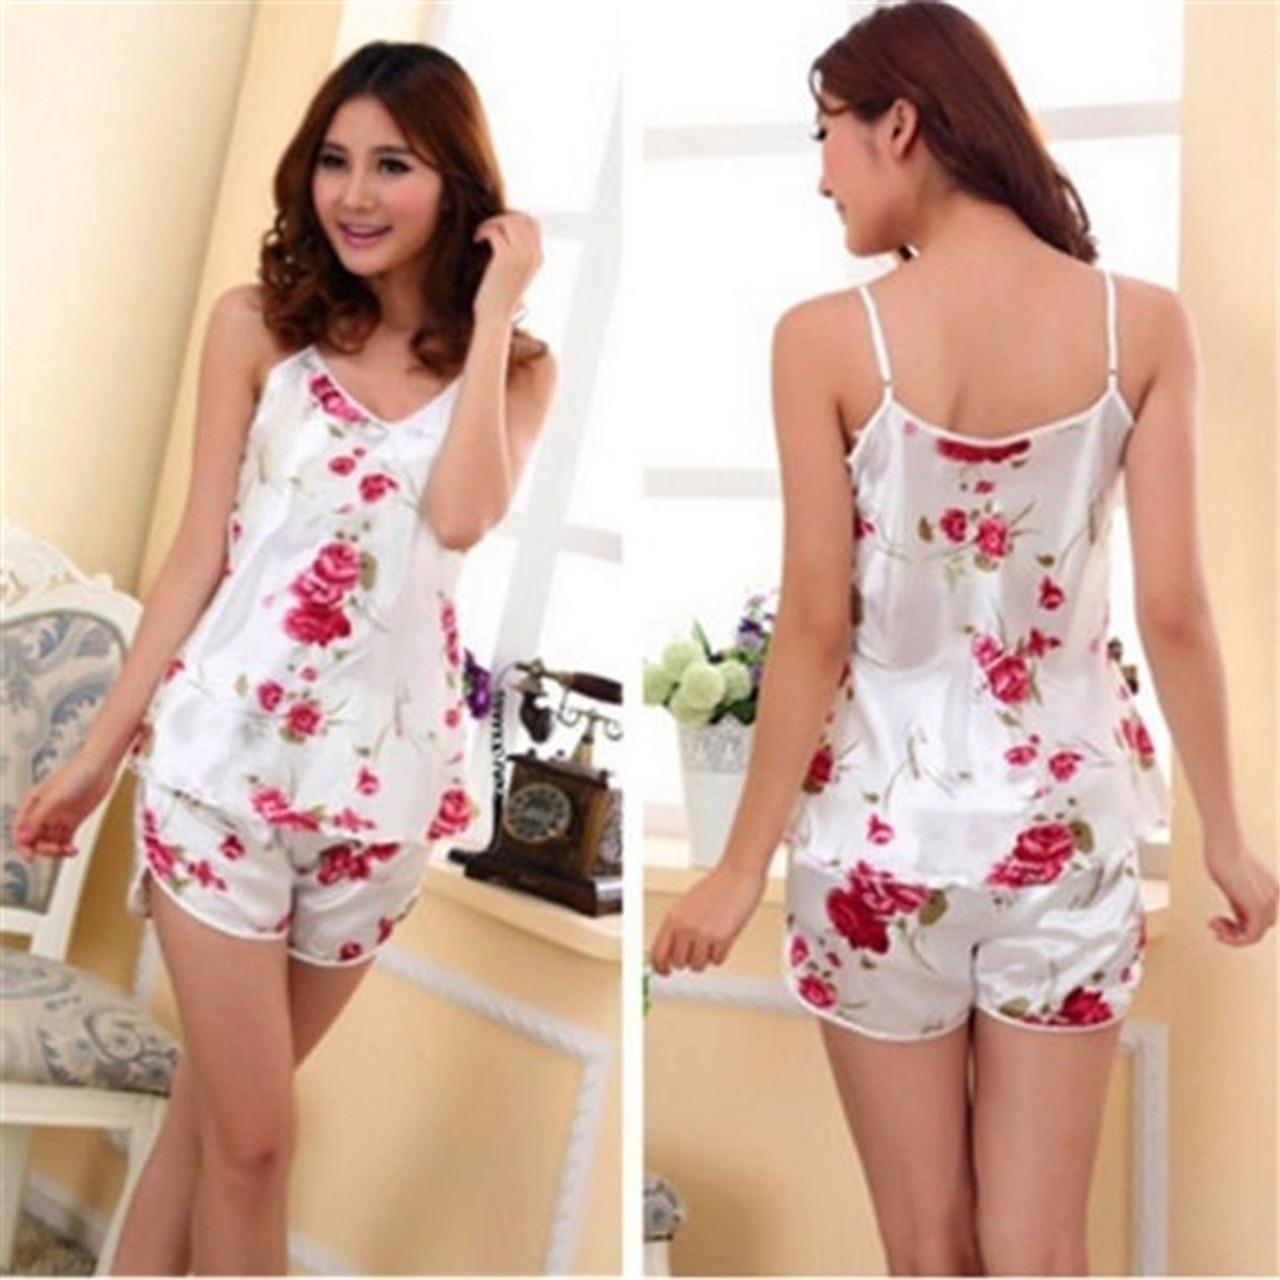 6e518ece79 Sexy Flower Sleepwear Braces Shirts + Shorts Underwear Pajamas Robes Set  for woman vetement femme - OnshopDeals.Com